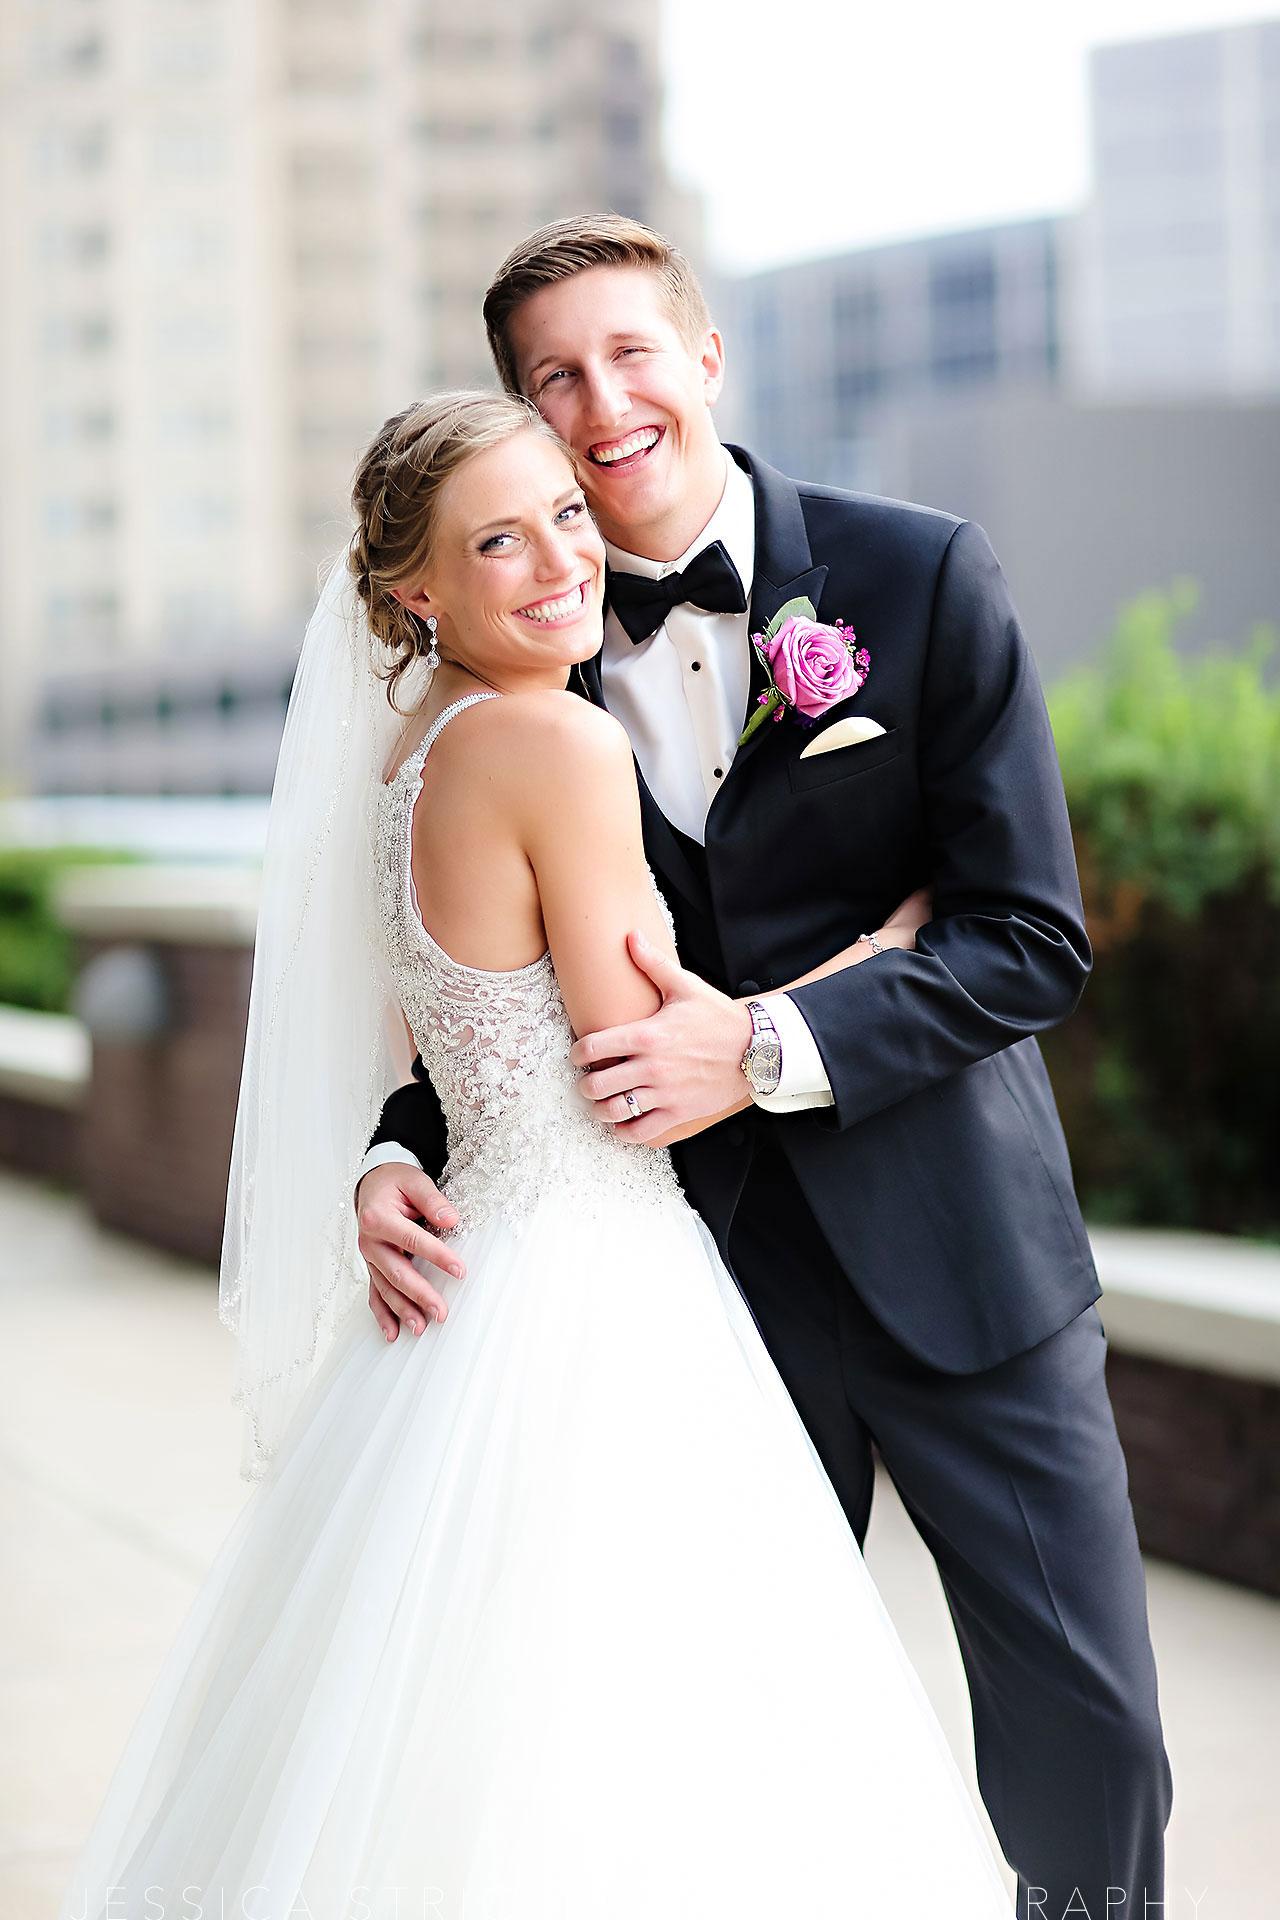 Serra Alex Regions Tower Indianapolis Wedding 261 watermarked